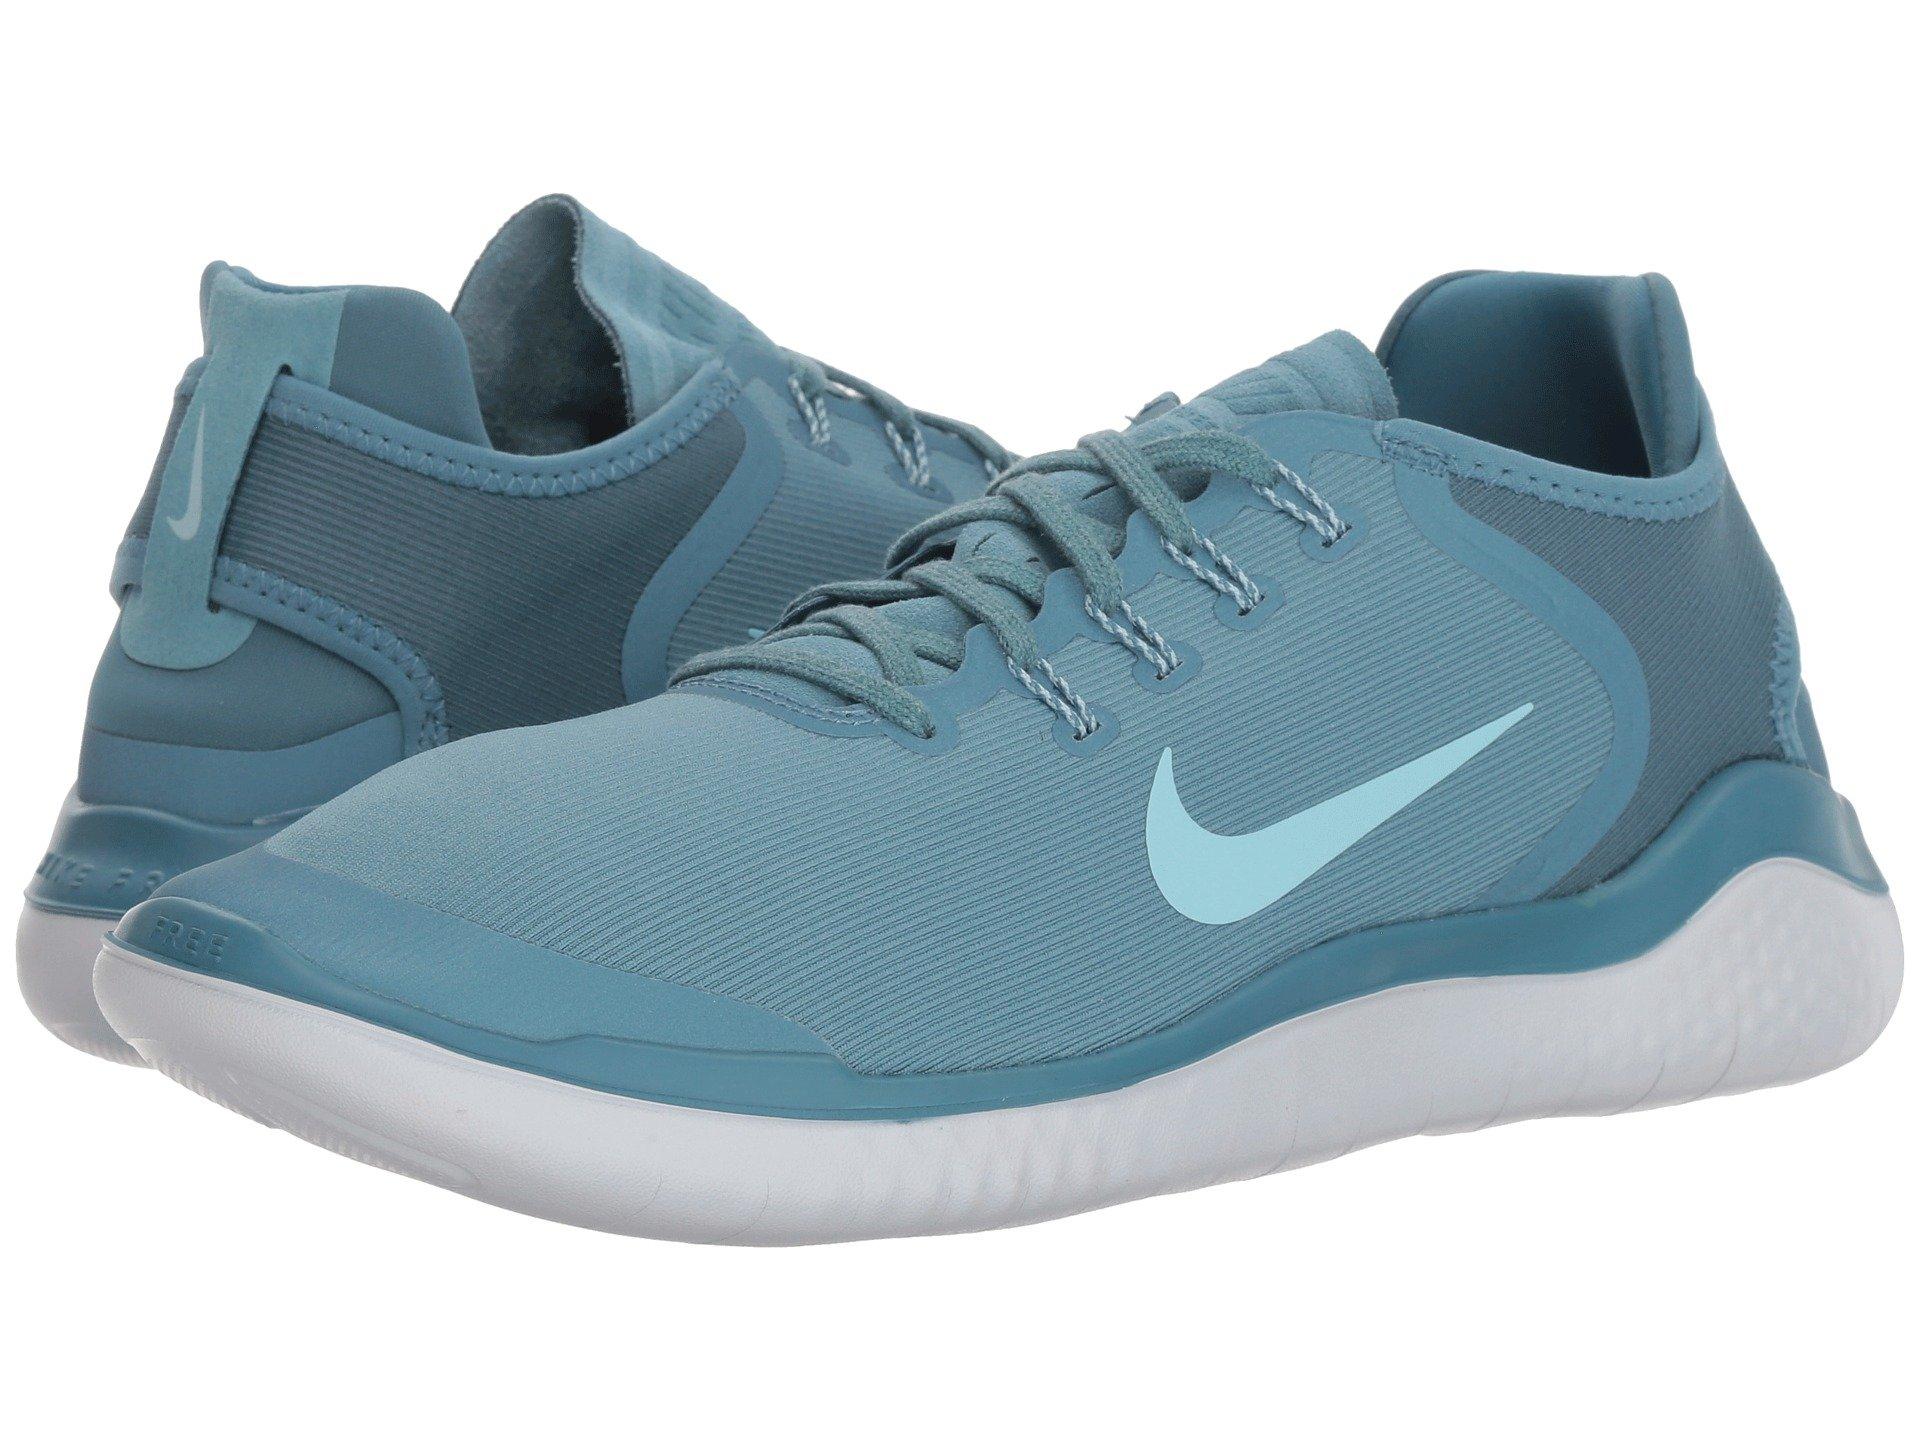 Nike Free RN 2018 Sun Running Shoe (8 D(M) US, Noise Aqua/Pure Platinum) by Nike (Image #7)